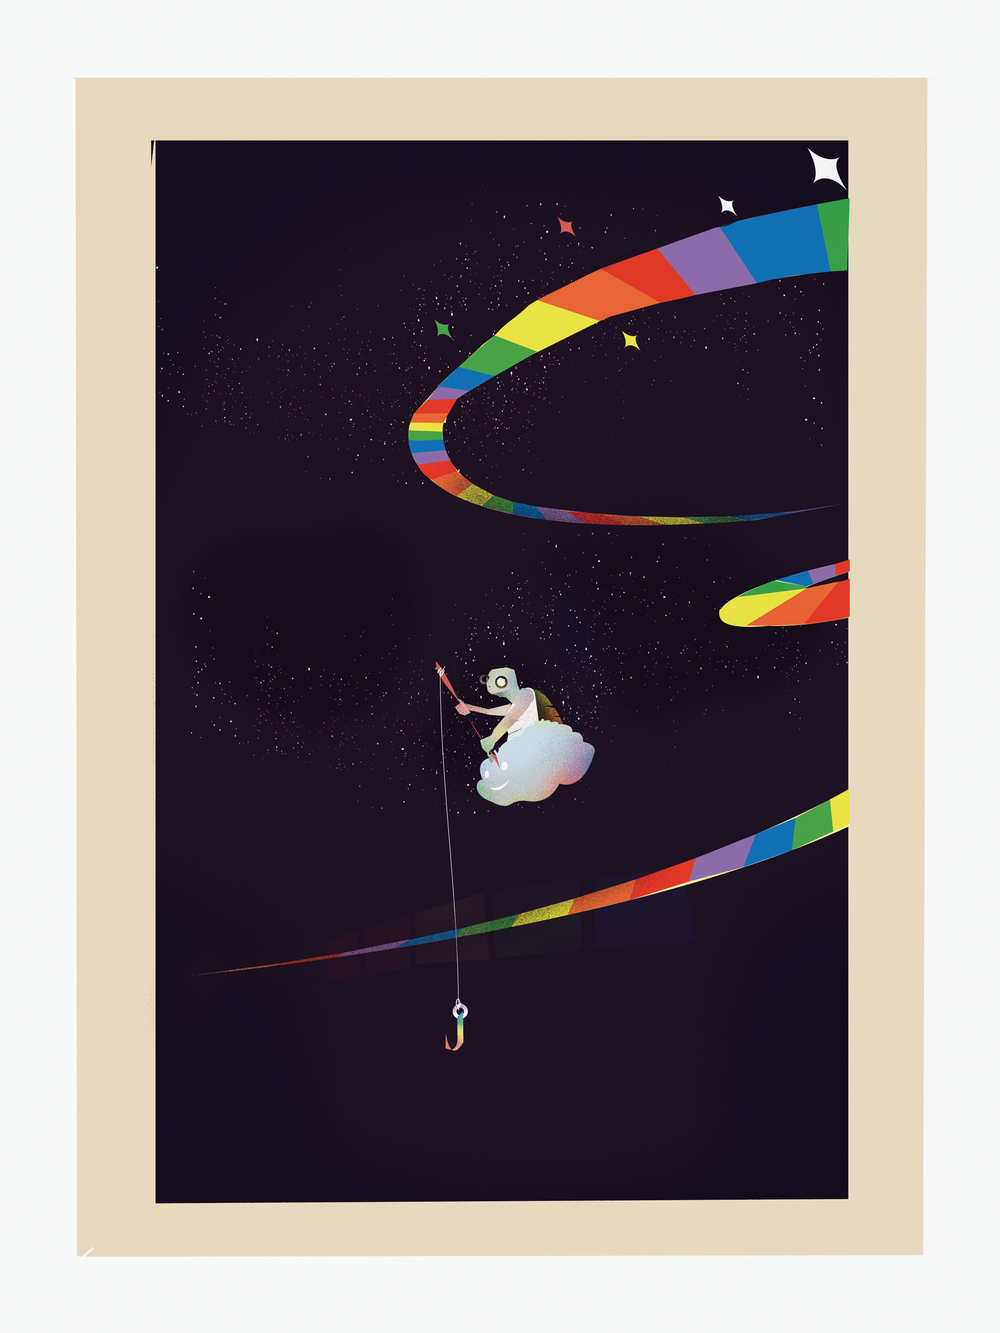 rainbowroadfinal small.jpg